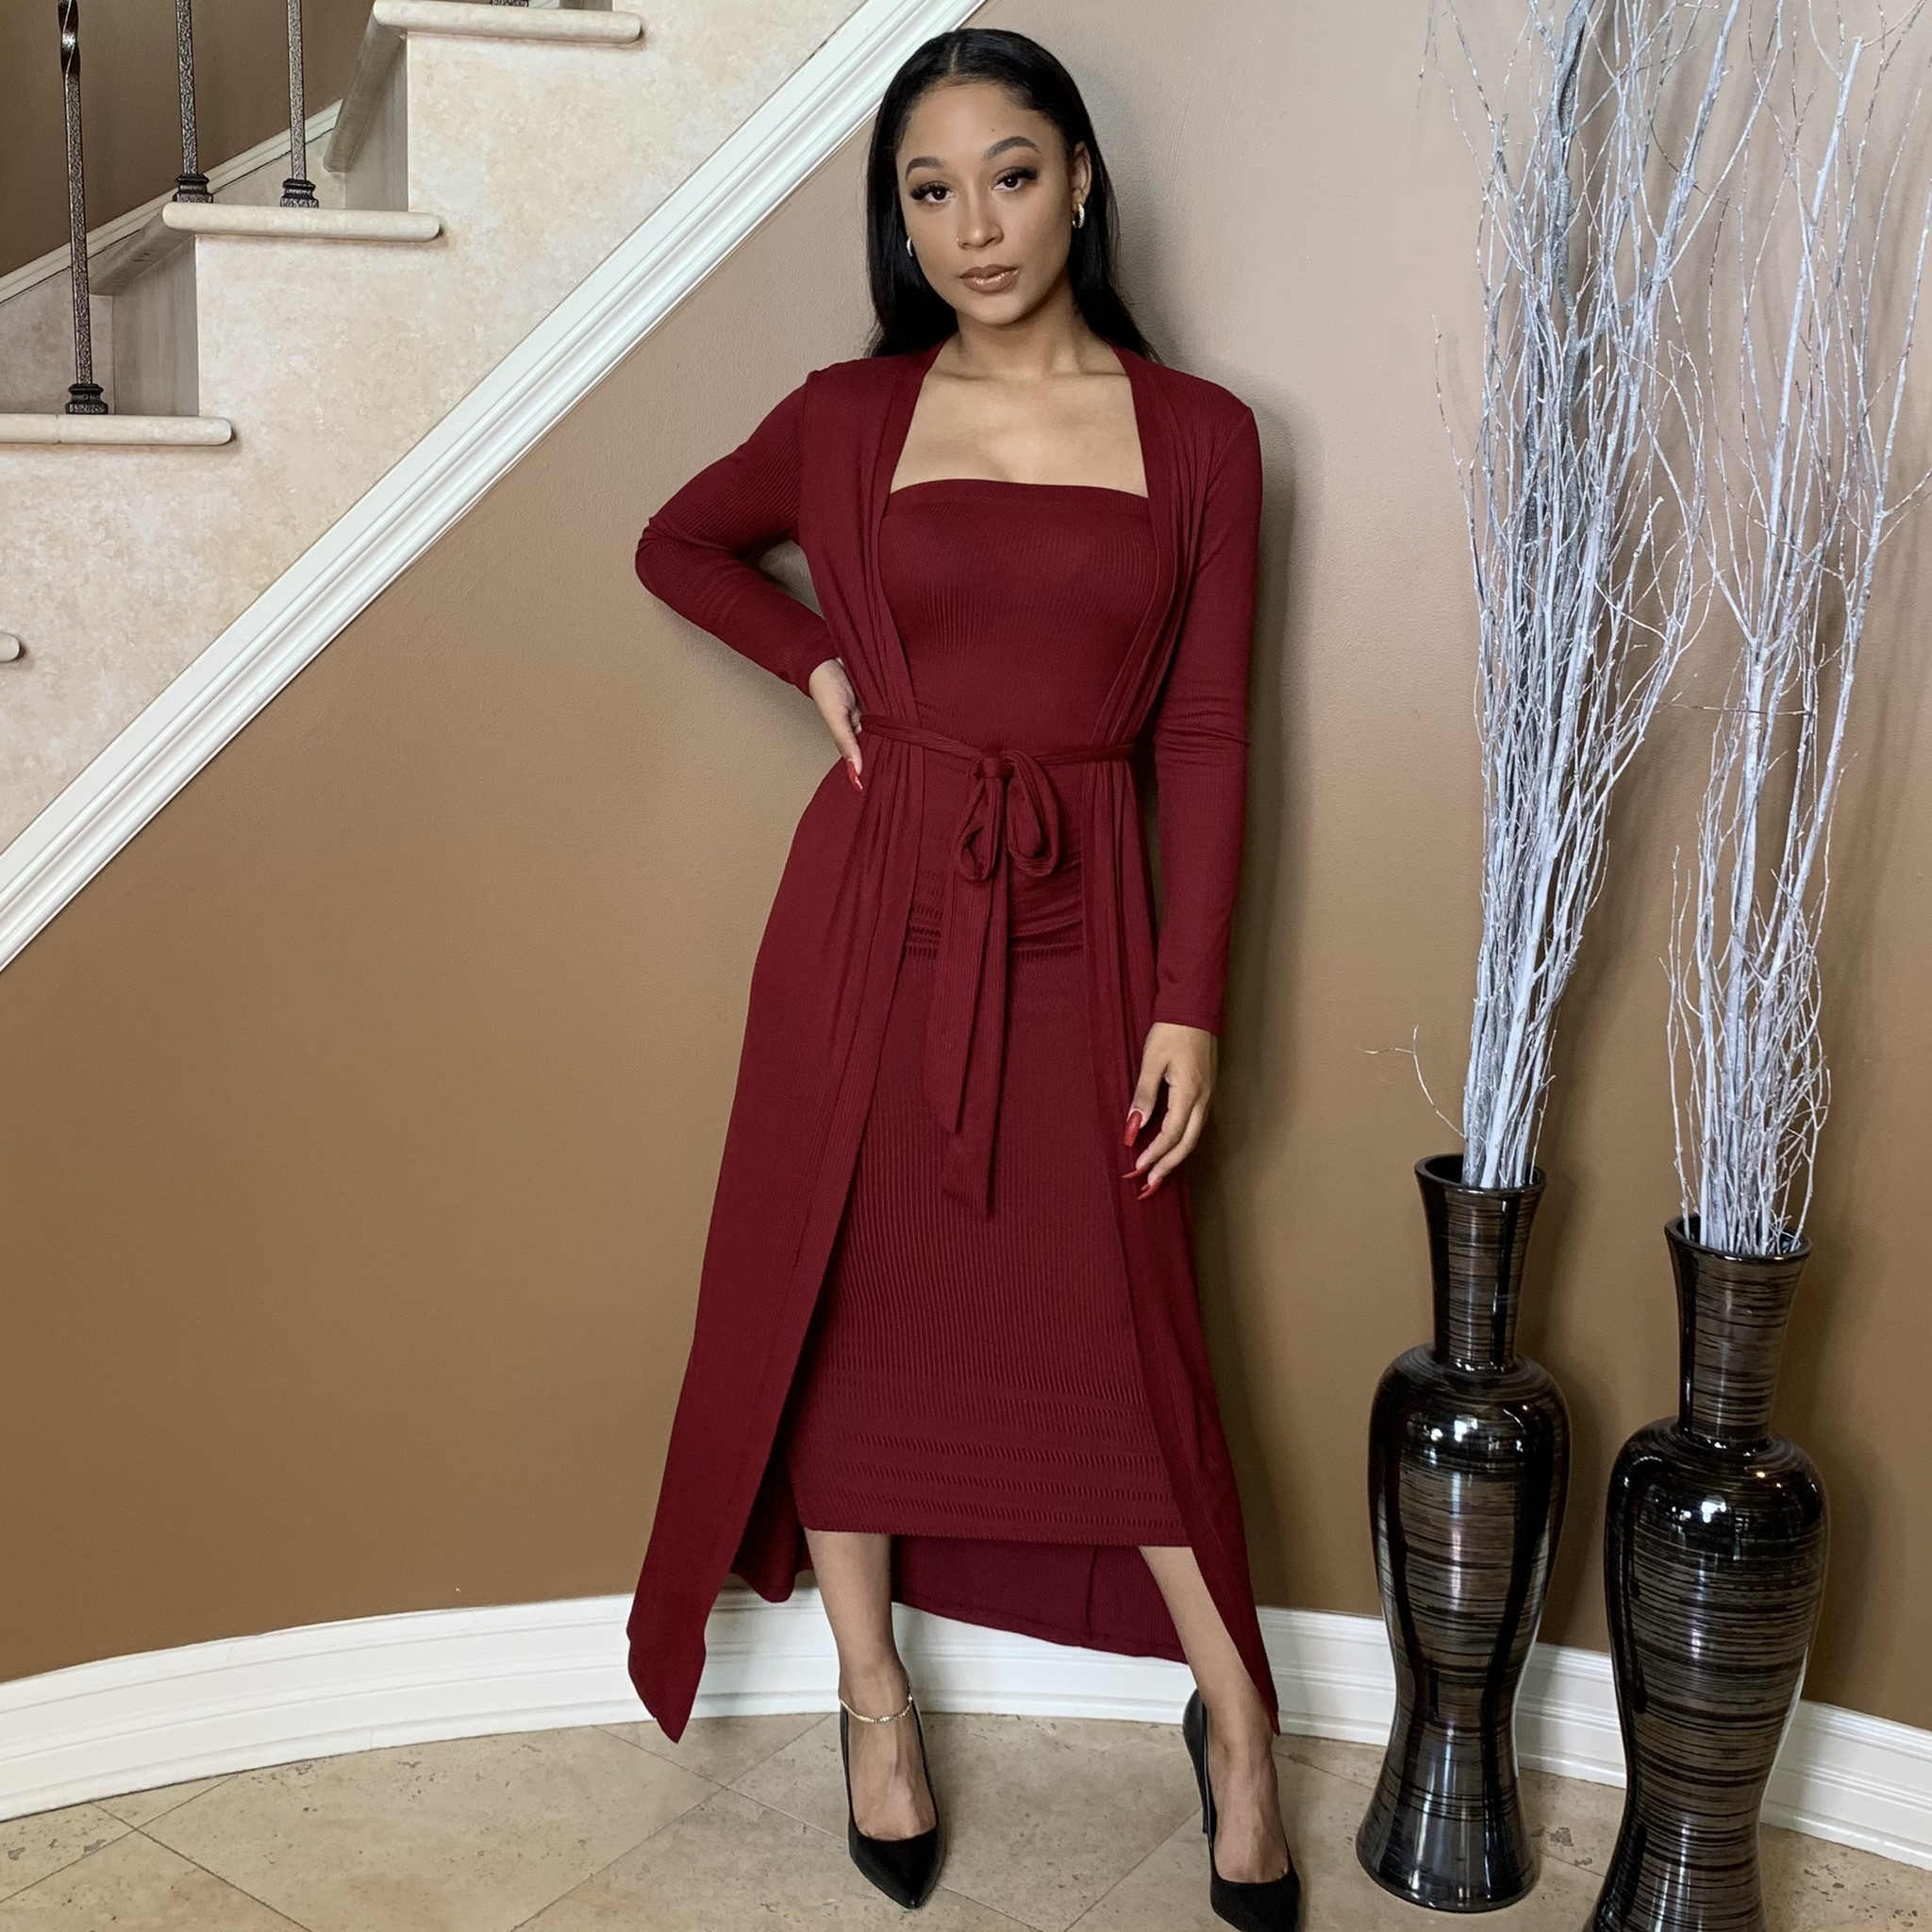 Ruby Dee Two Piece Dress Set